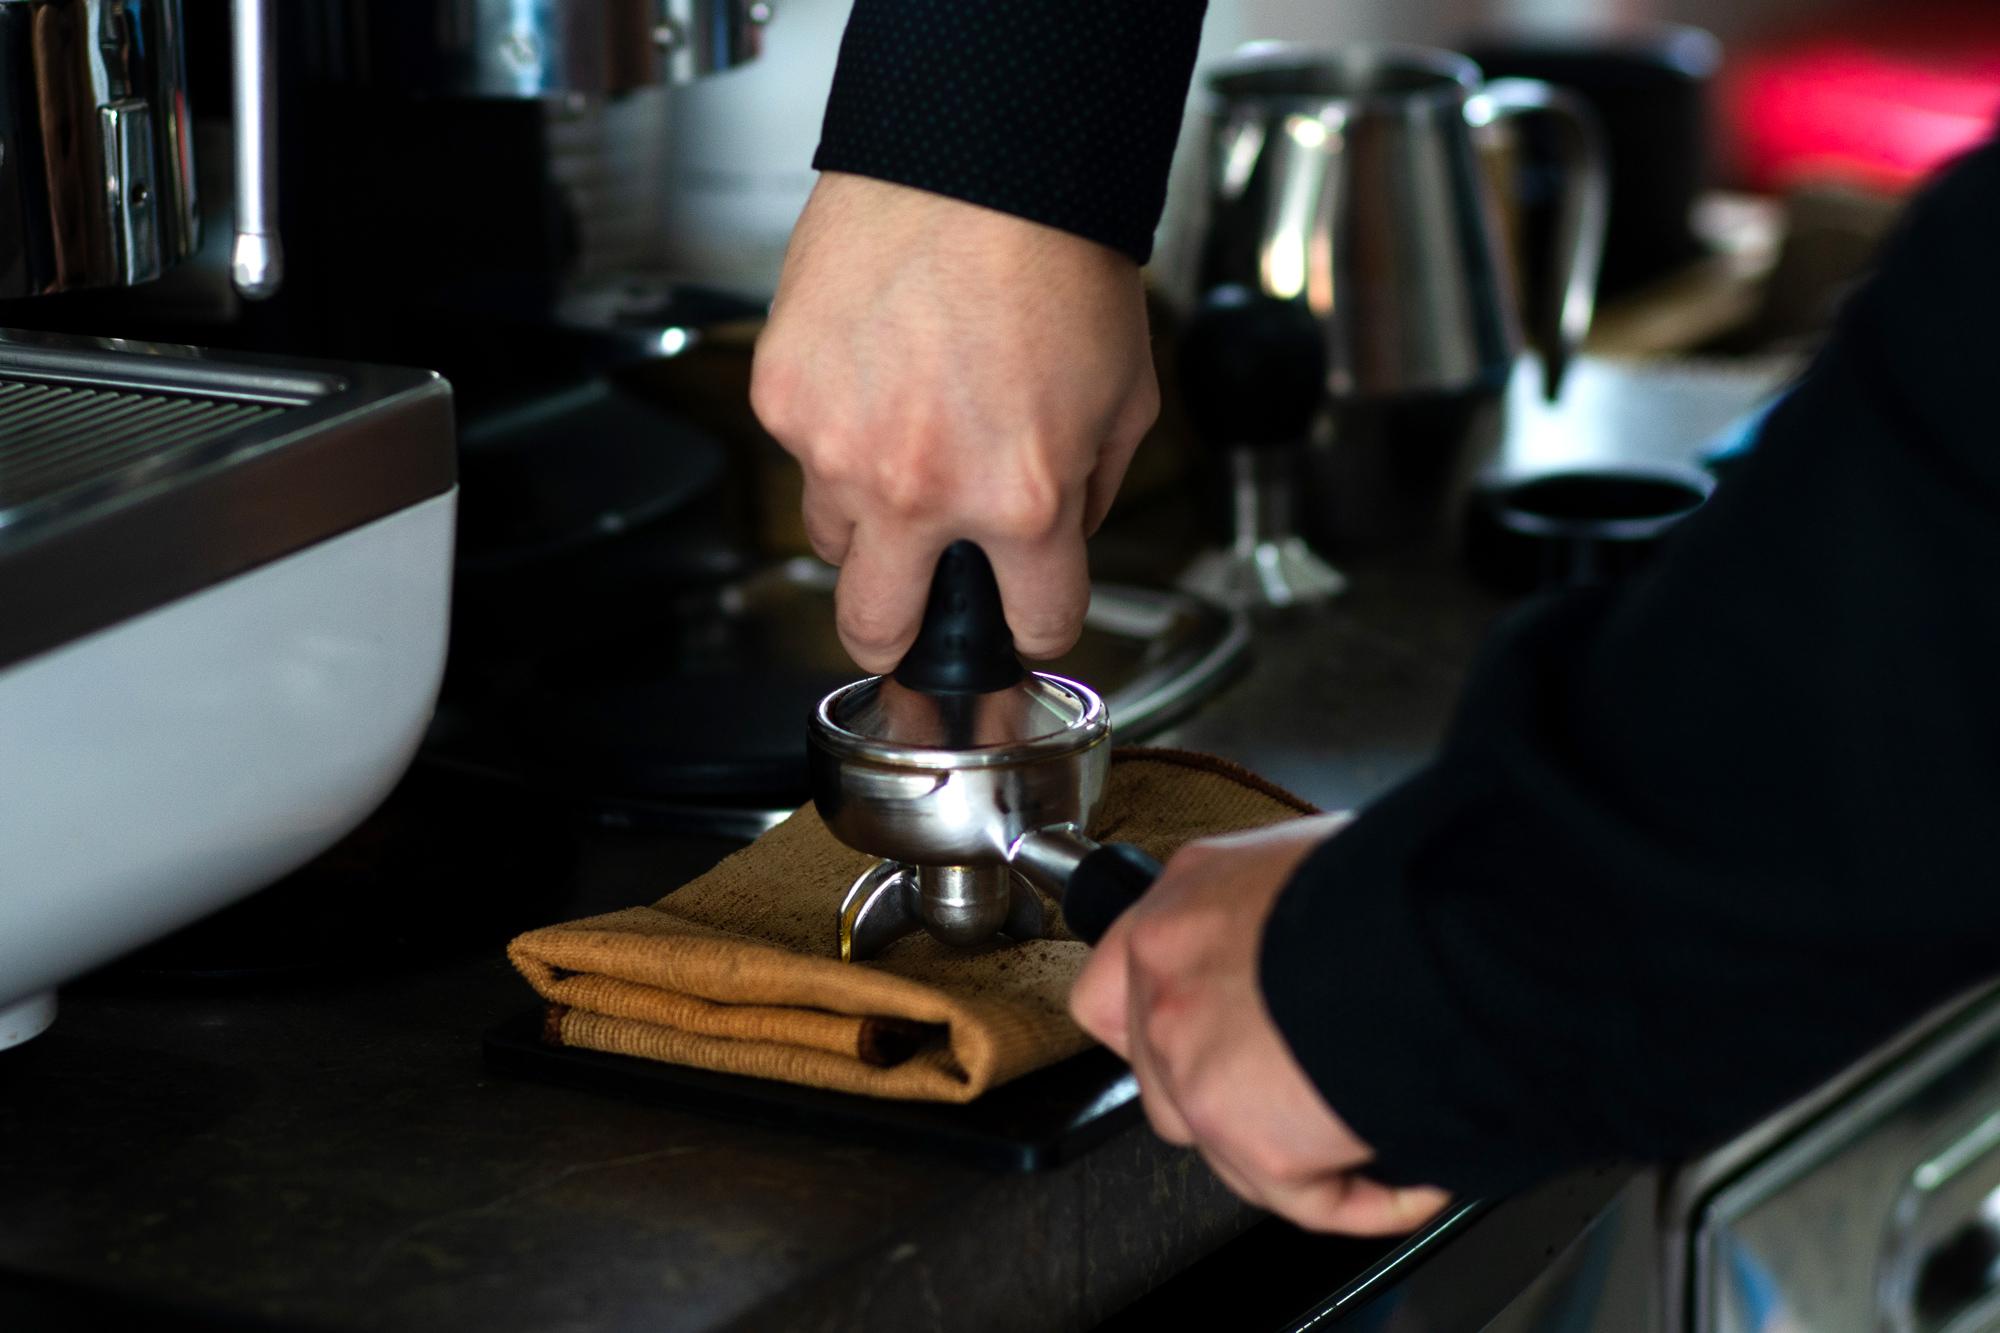 Cafe-La-Nacional-34.jpg